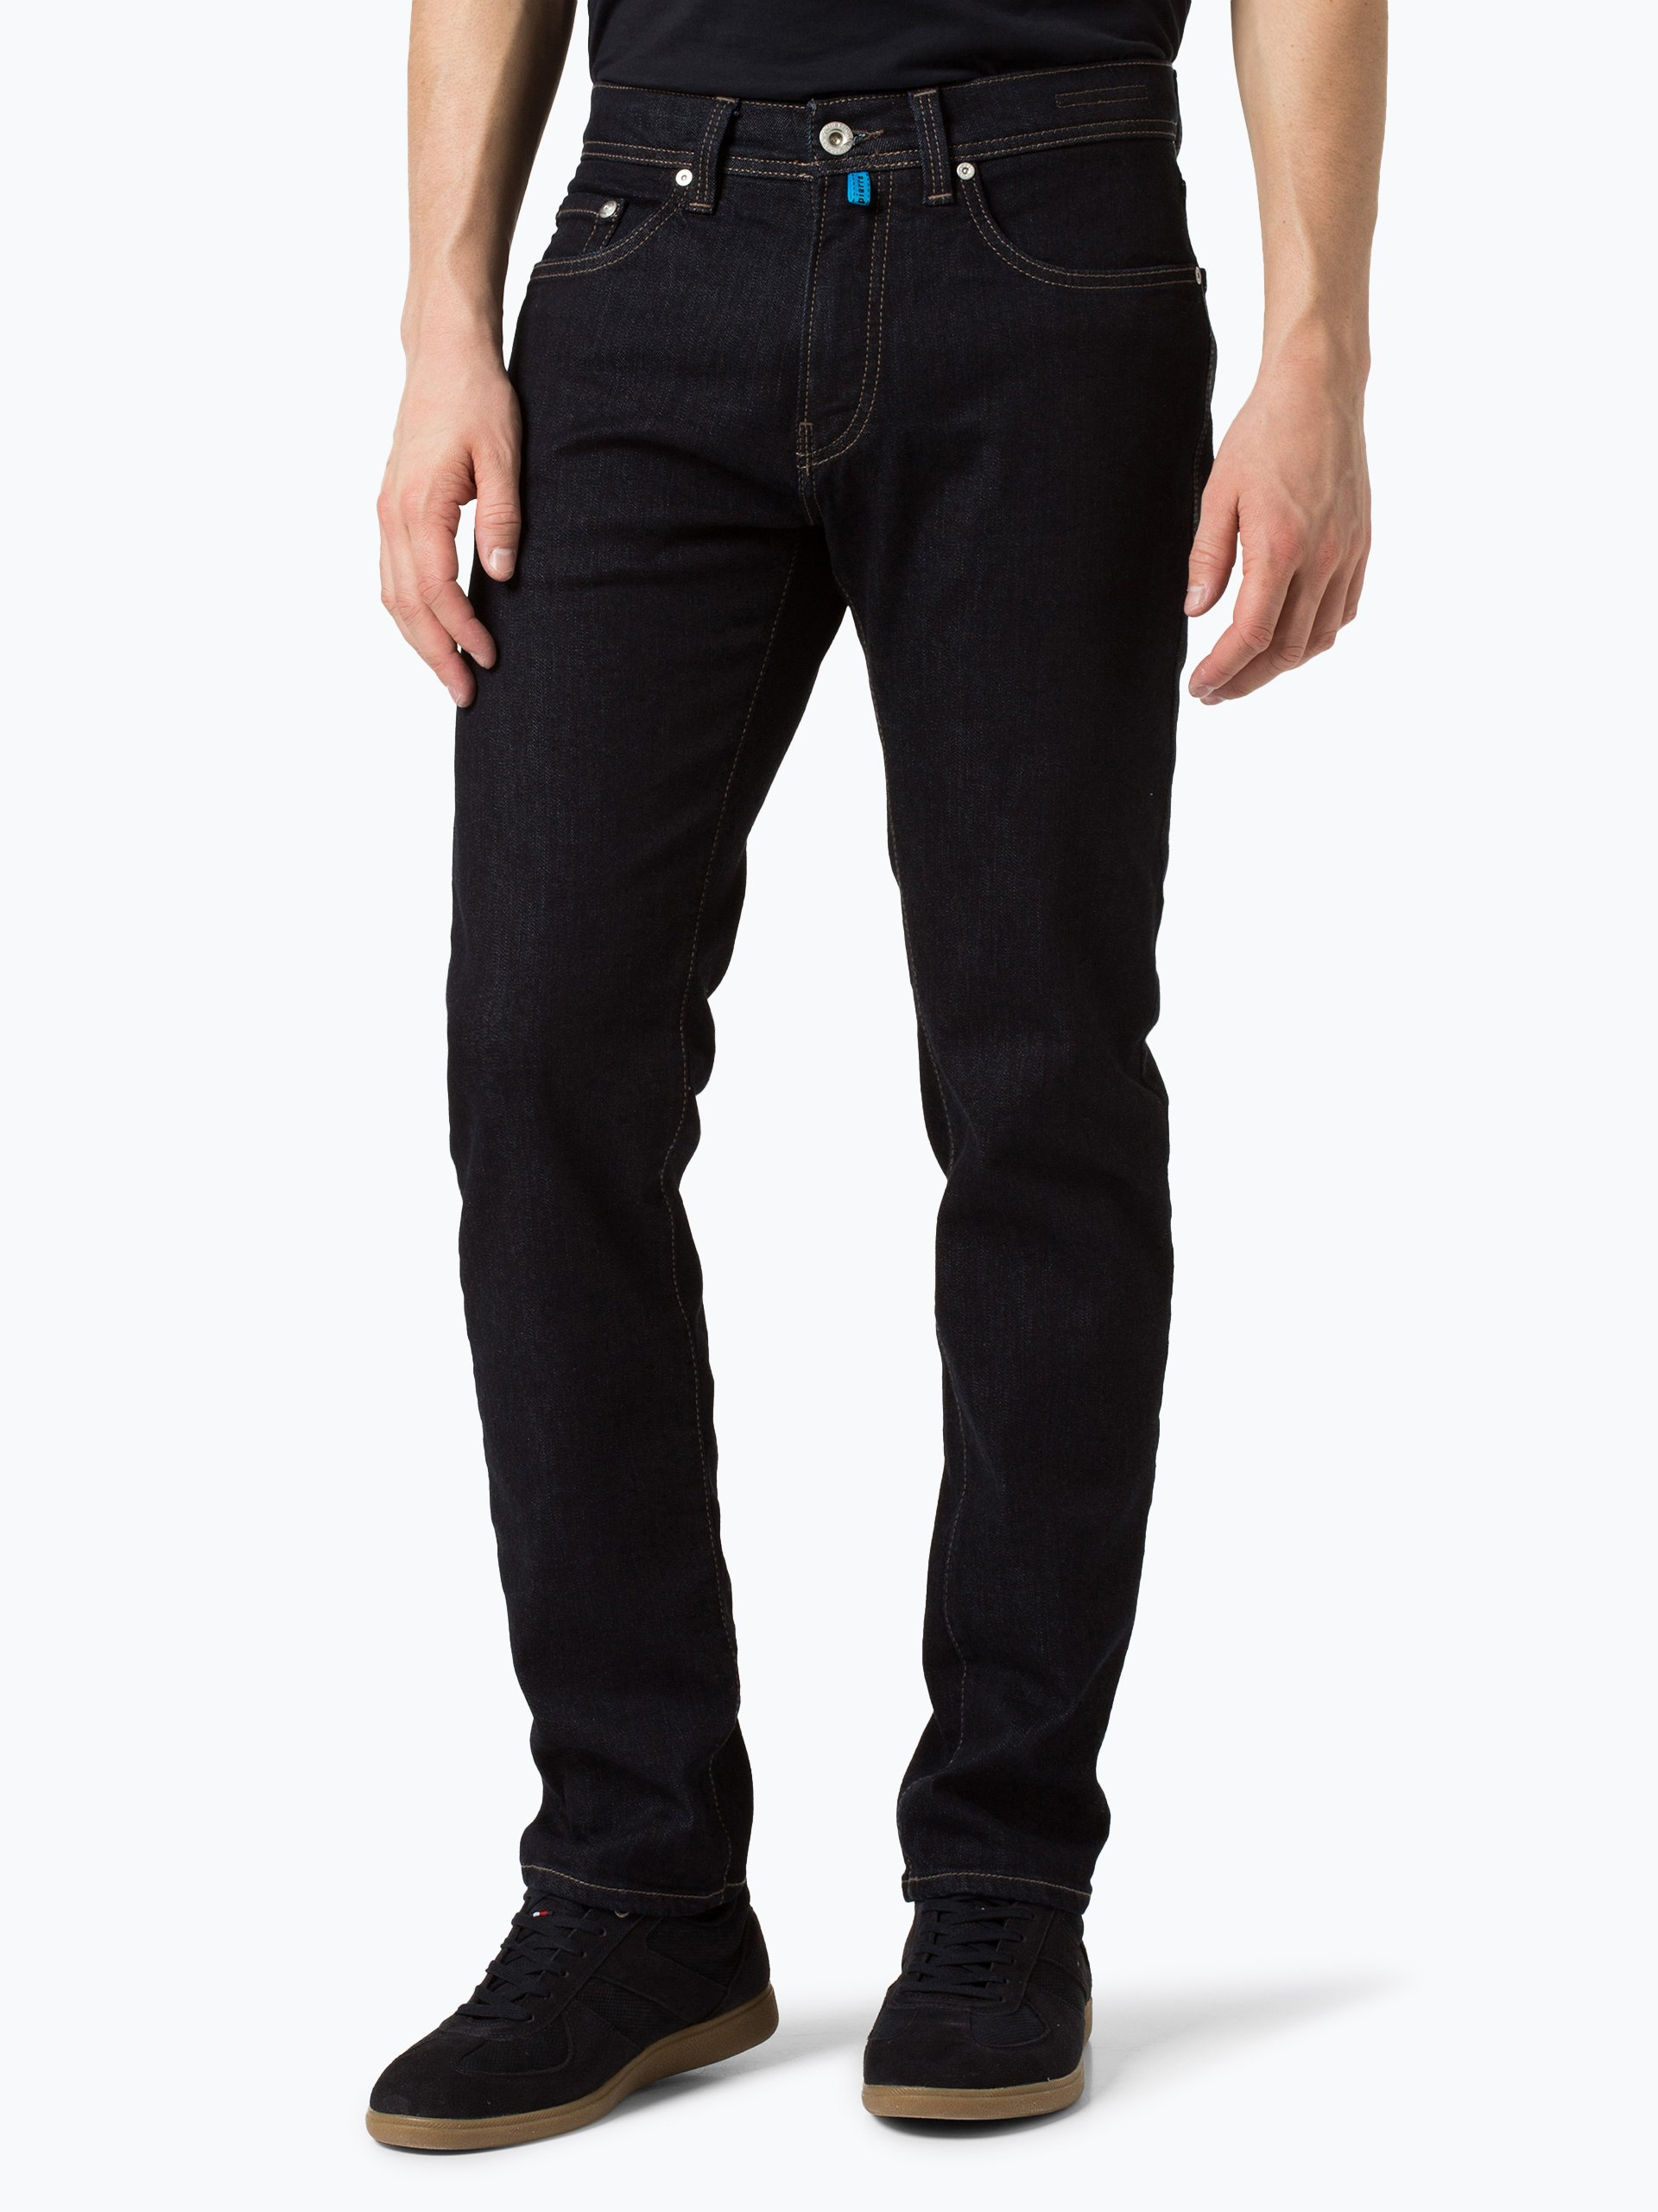 Pierre Cardin Herren Jeans - Future Flex